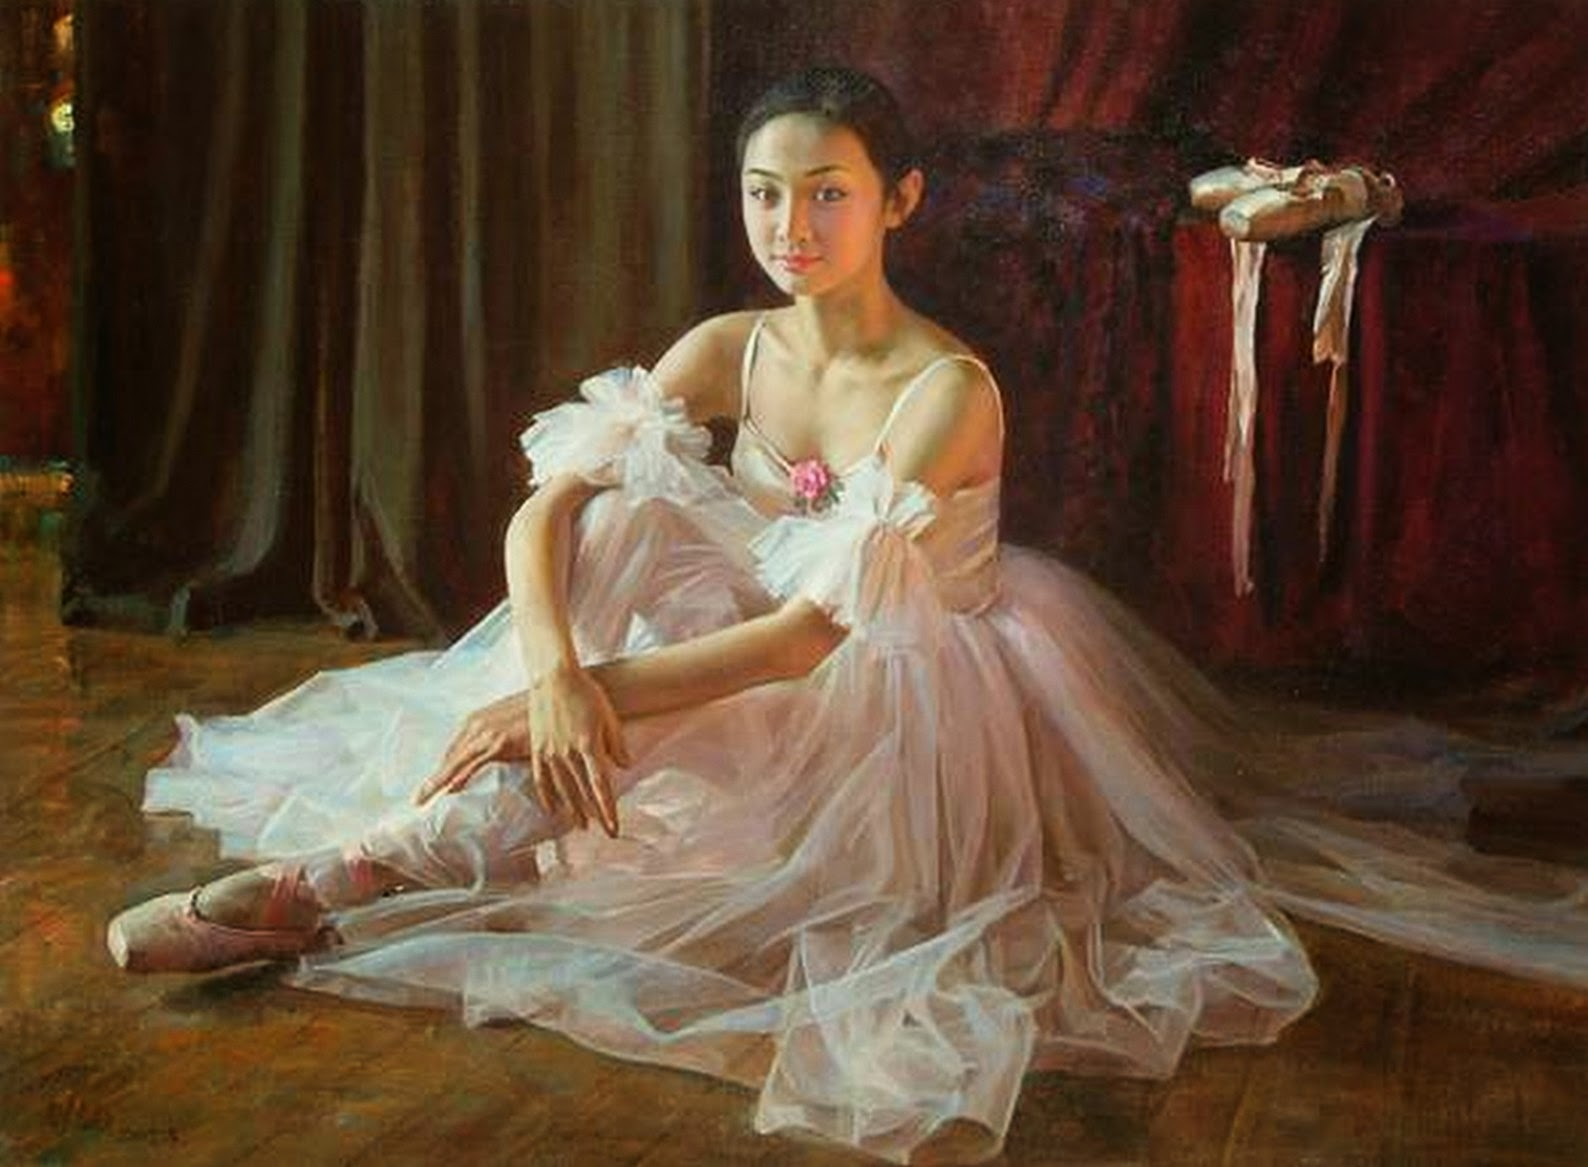 pinturas-de-mujeres-bailarinas-de-balet